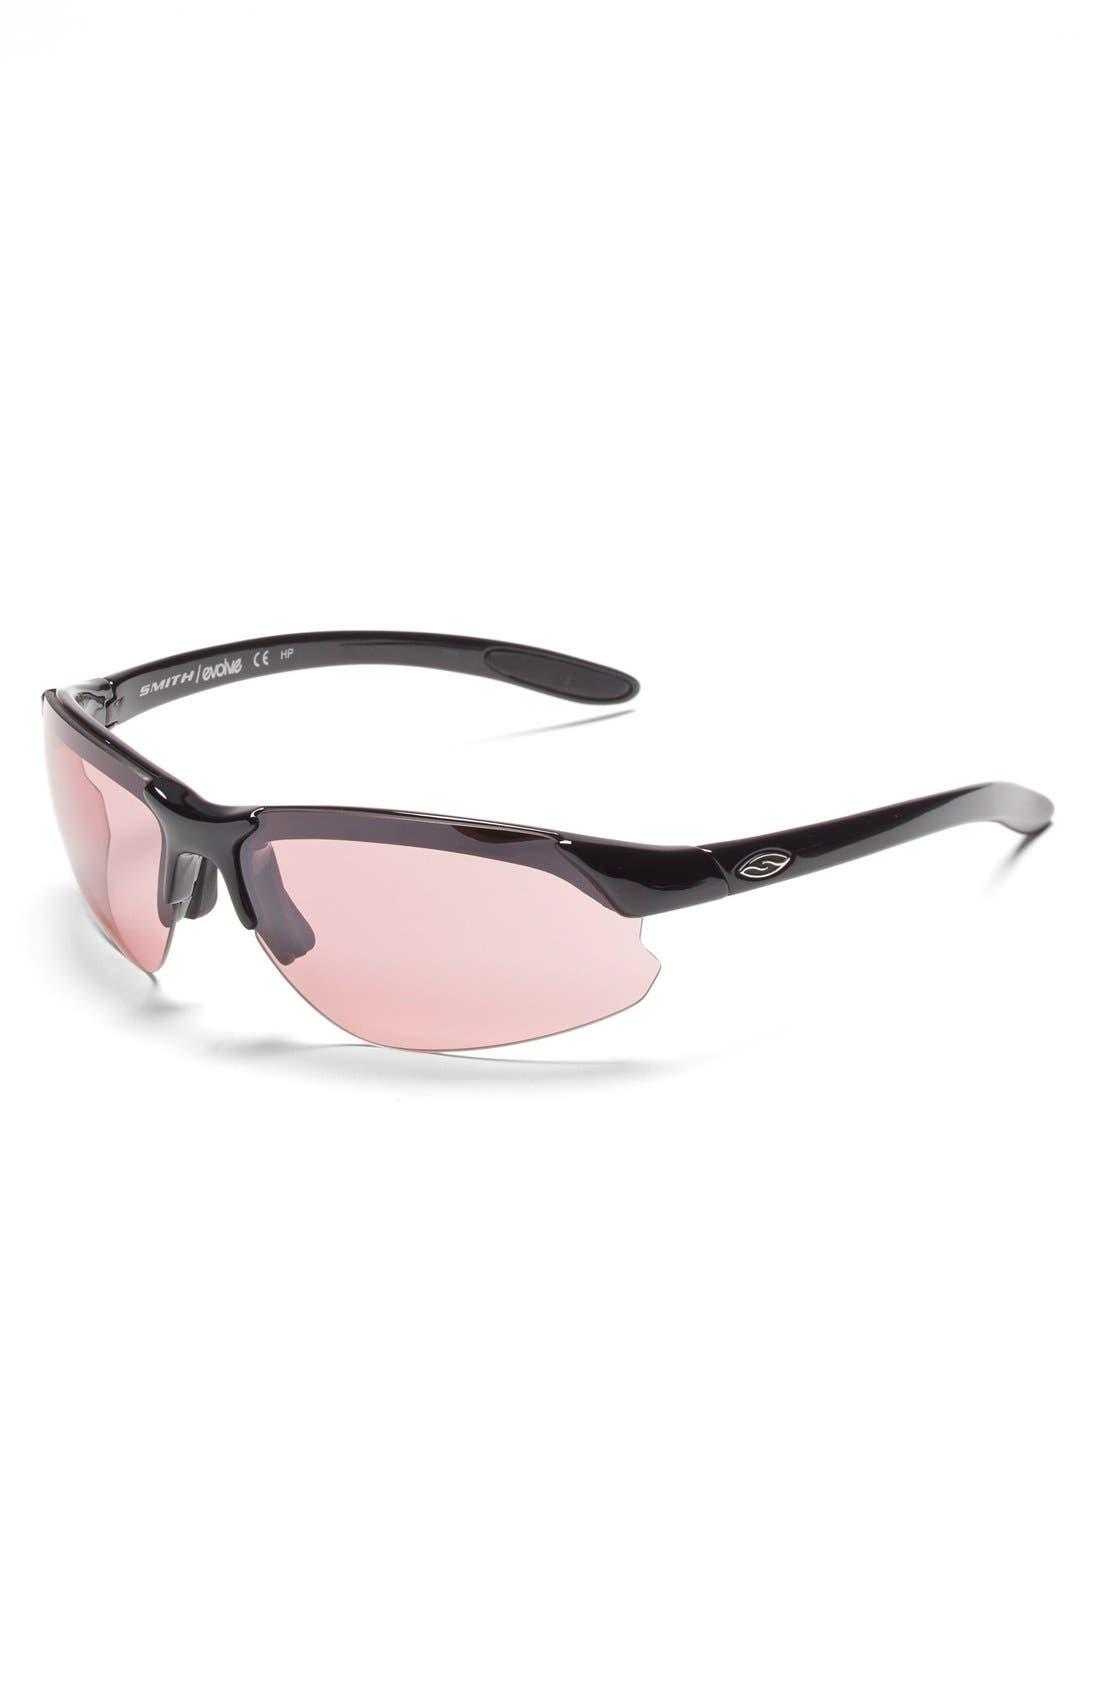 'Parallel DMax' 65mm Polarized Sunglasses,                             Alternate thumbnail 3, color,                             Black/ Polar Grey/ Clear